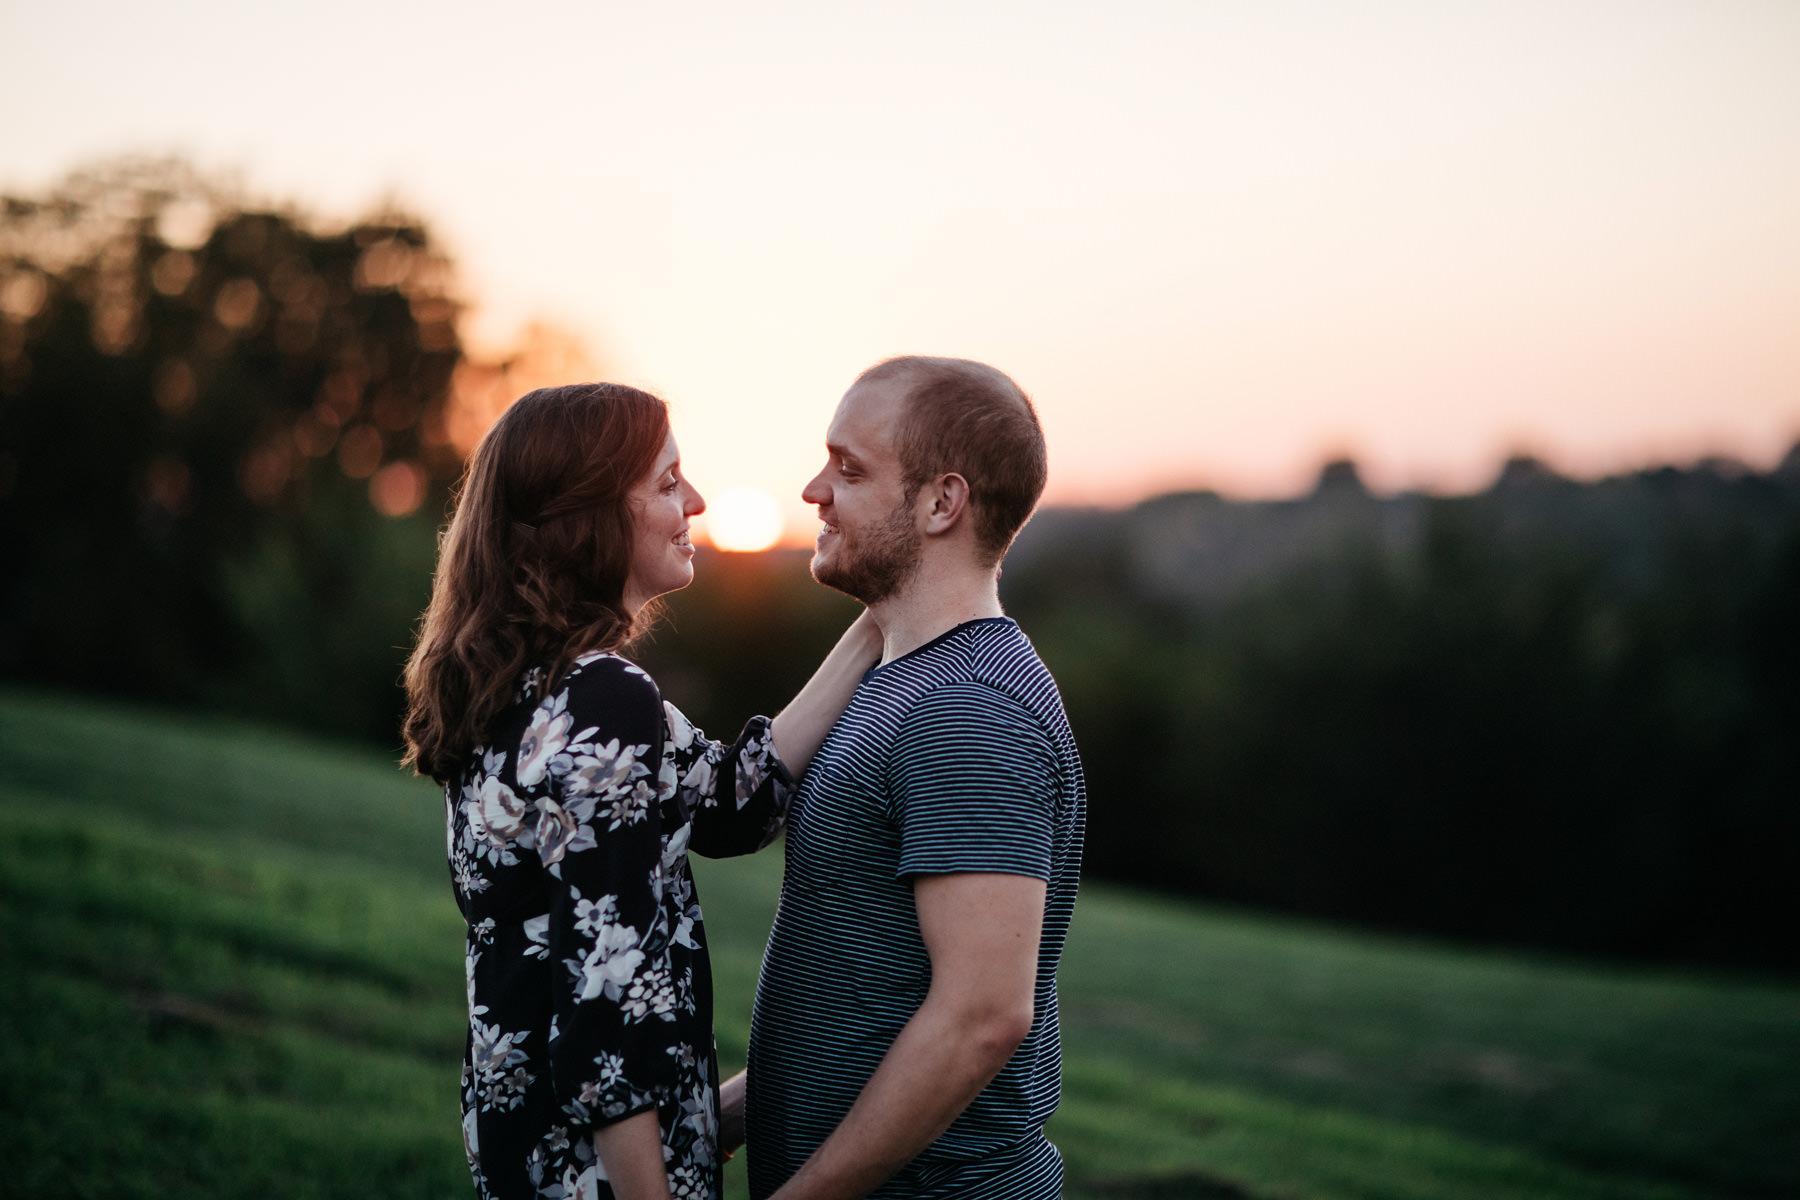 Kansas City_Penn Valley Park_Engagement Session_Kindling Wedding Photography49.JPG